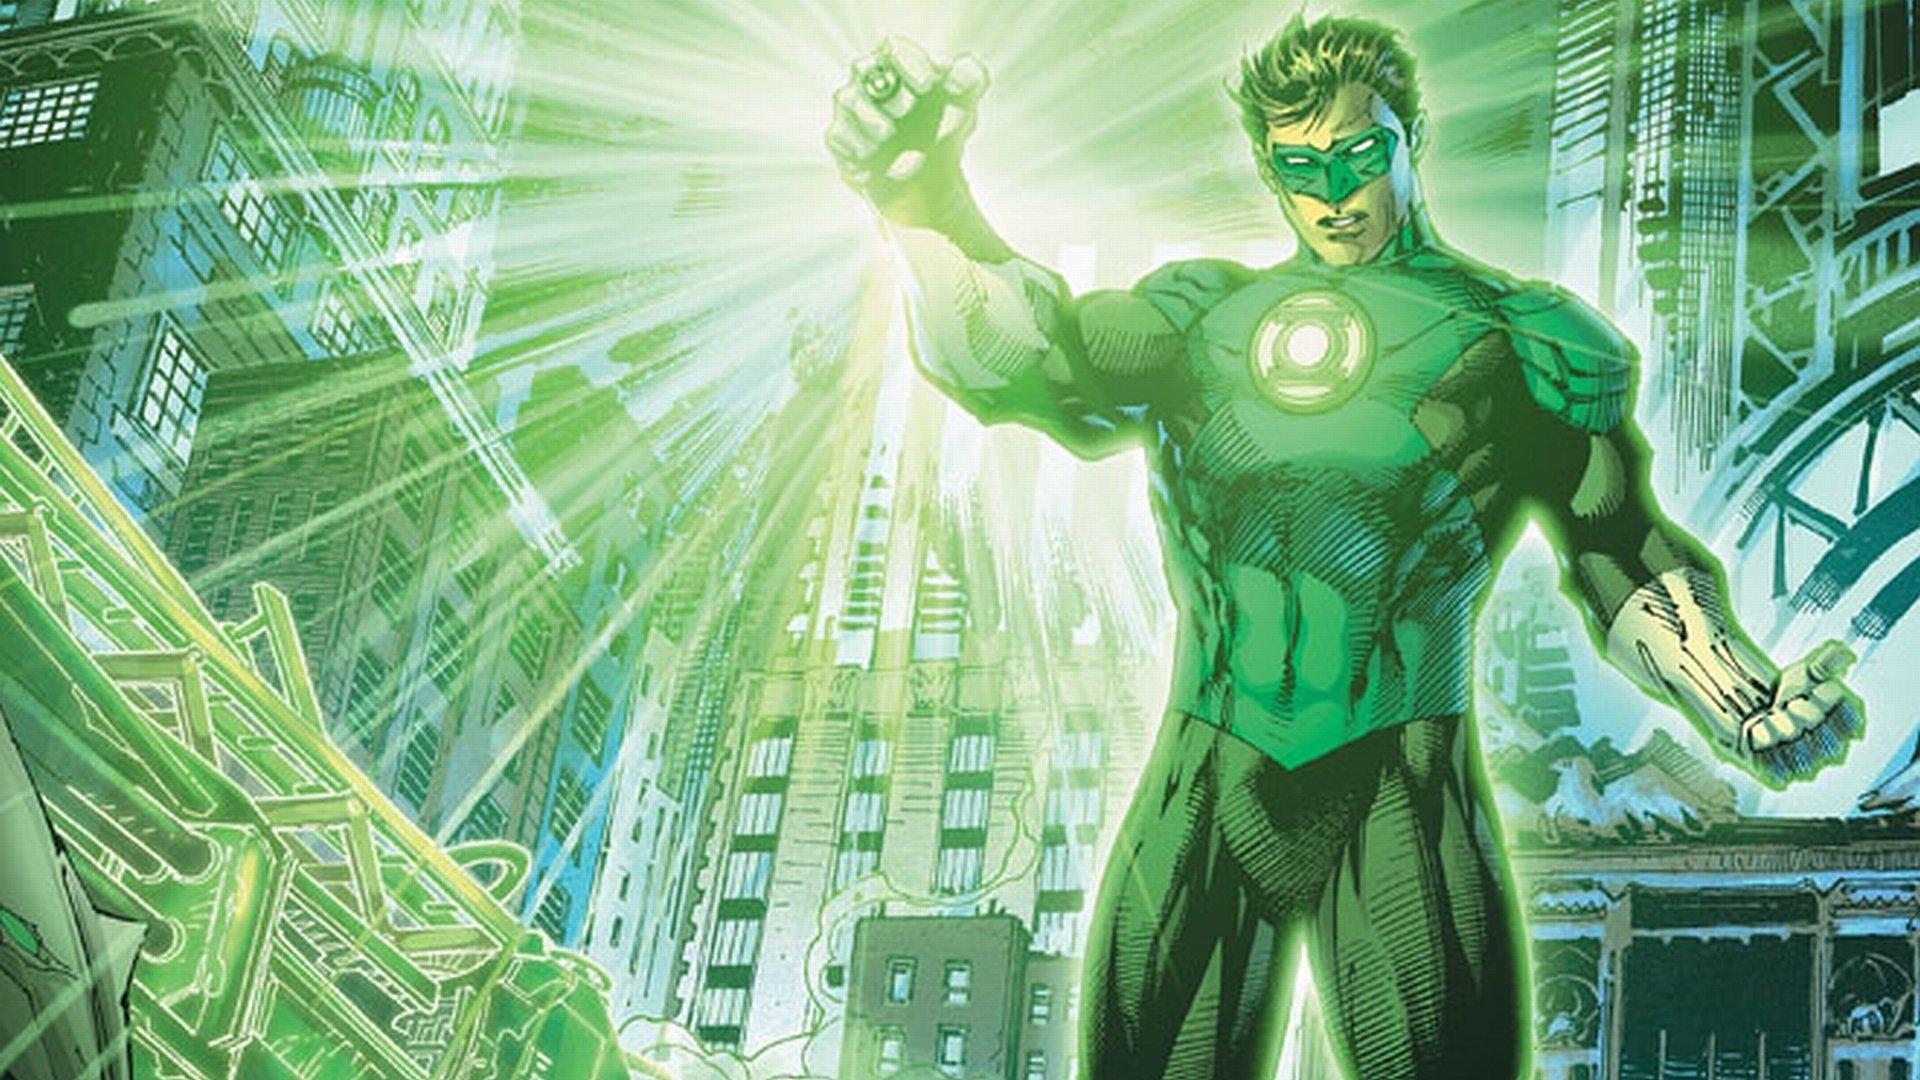 Green Lantern Comic Wallpaper: Green Lantern Full HD Wallpaper And Background Image